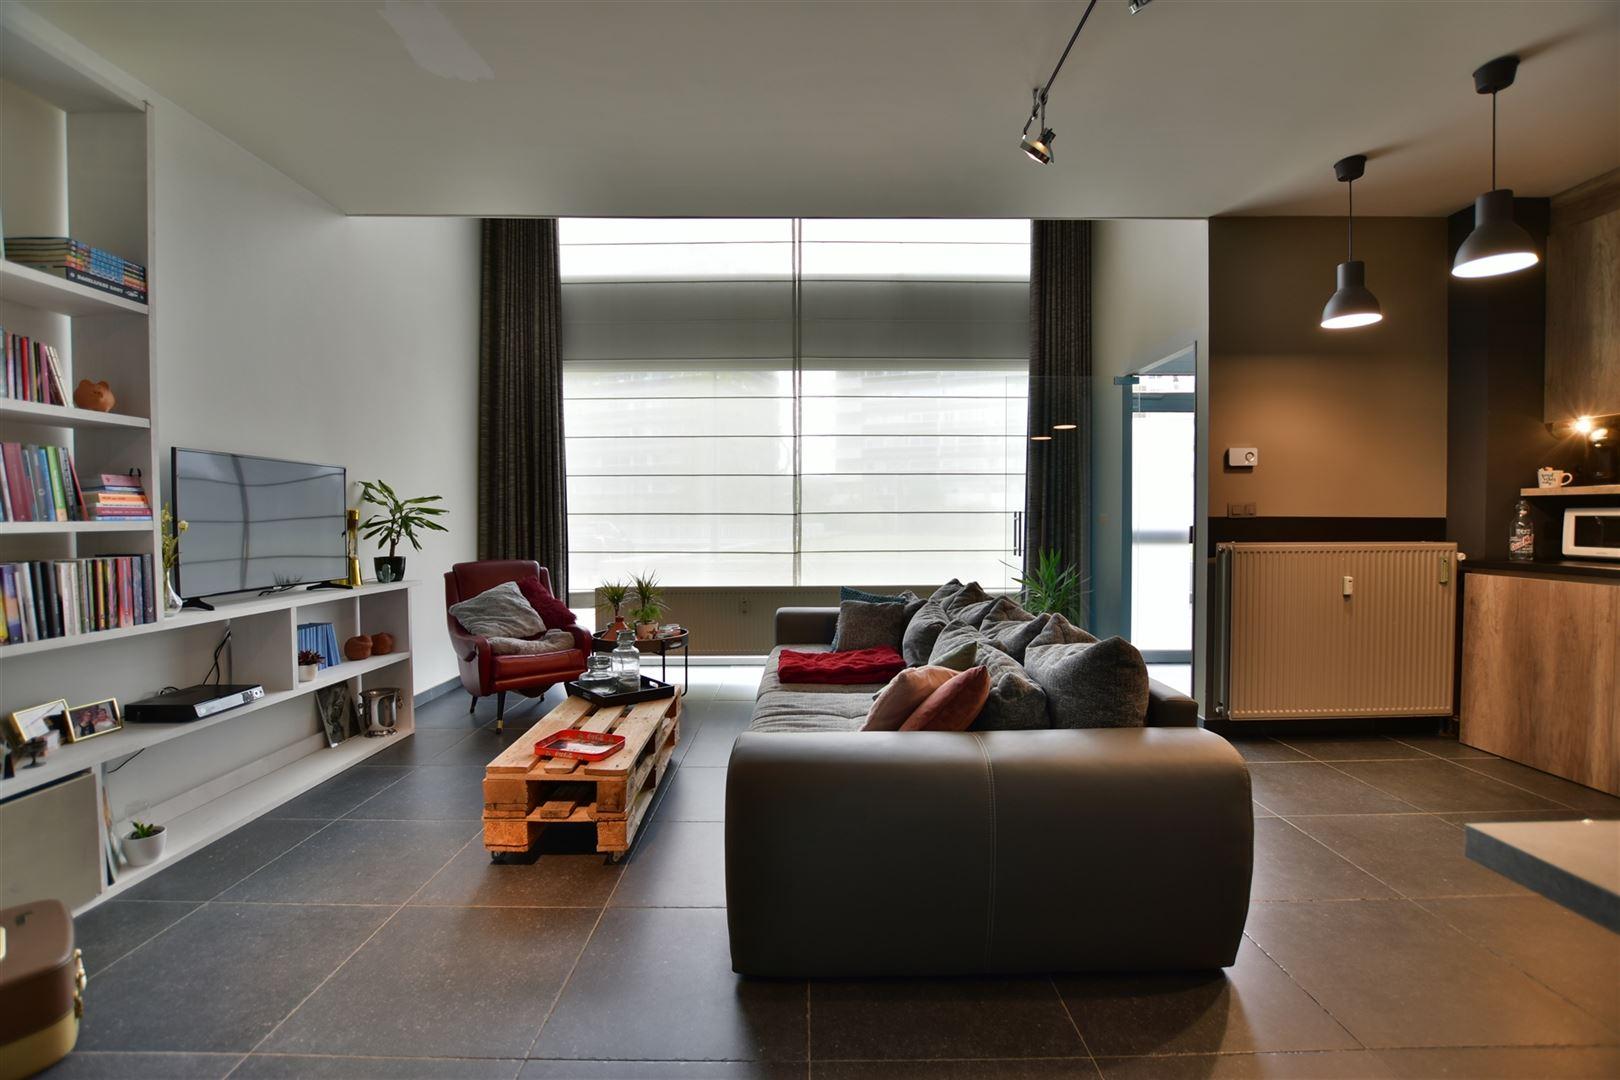 Foto 5 : Appartement te 9200 DENDERMONDE (België) - Prijs € 199.000